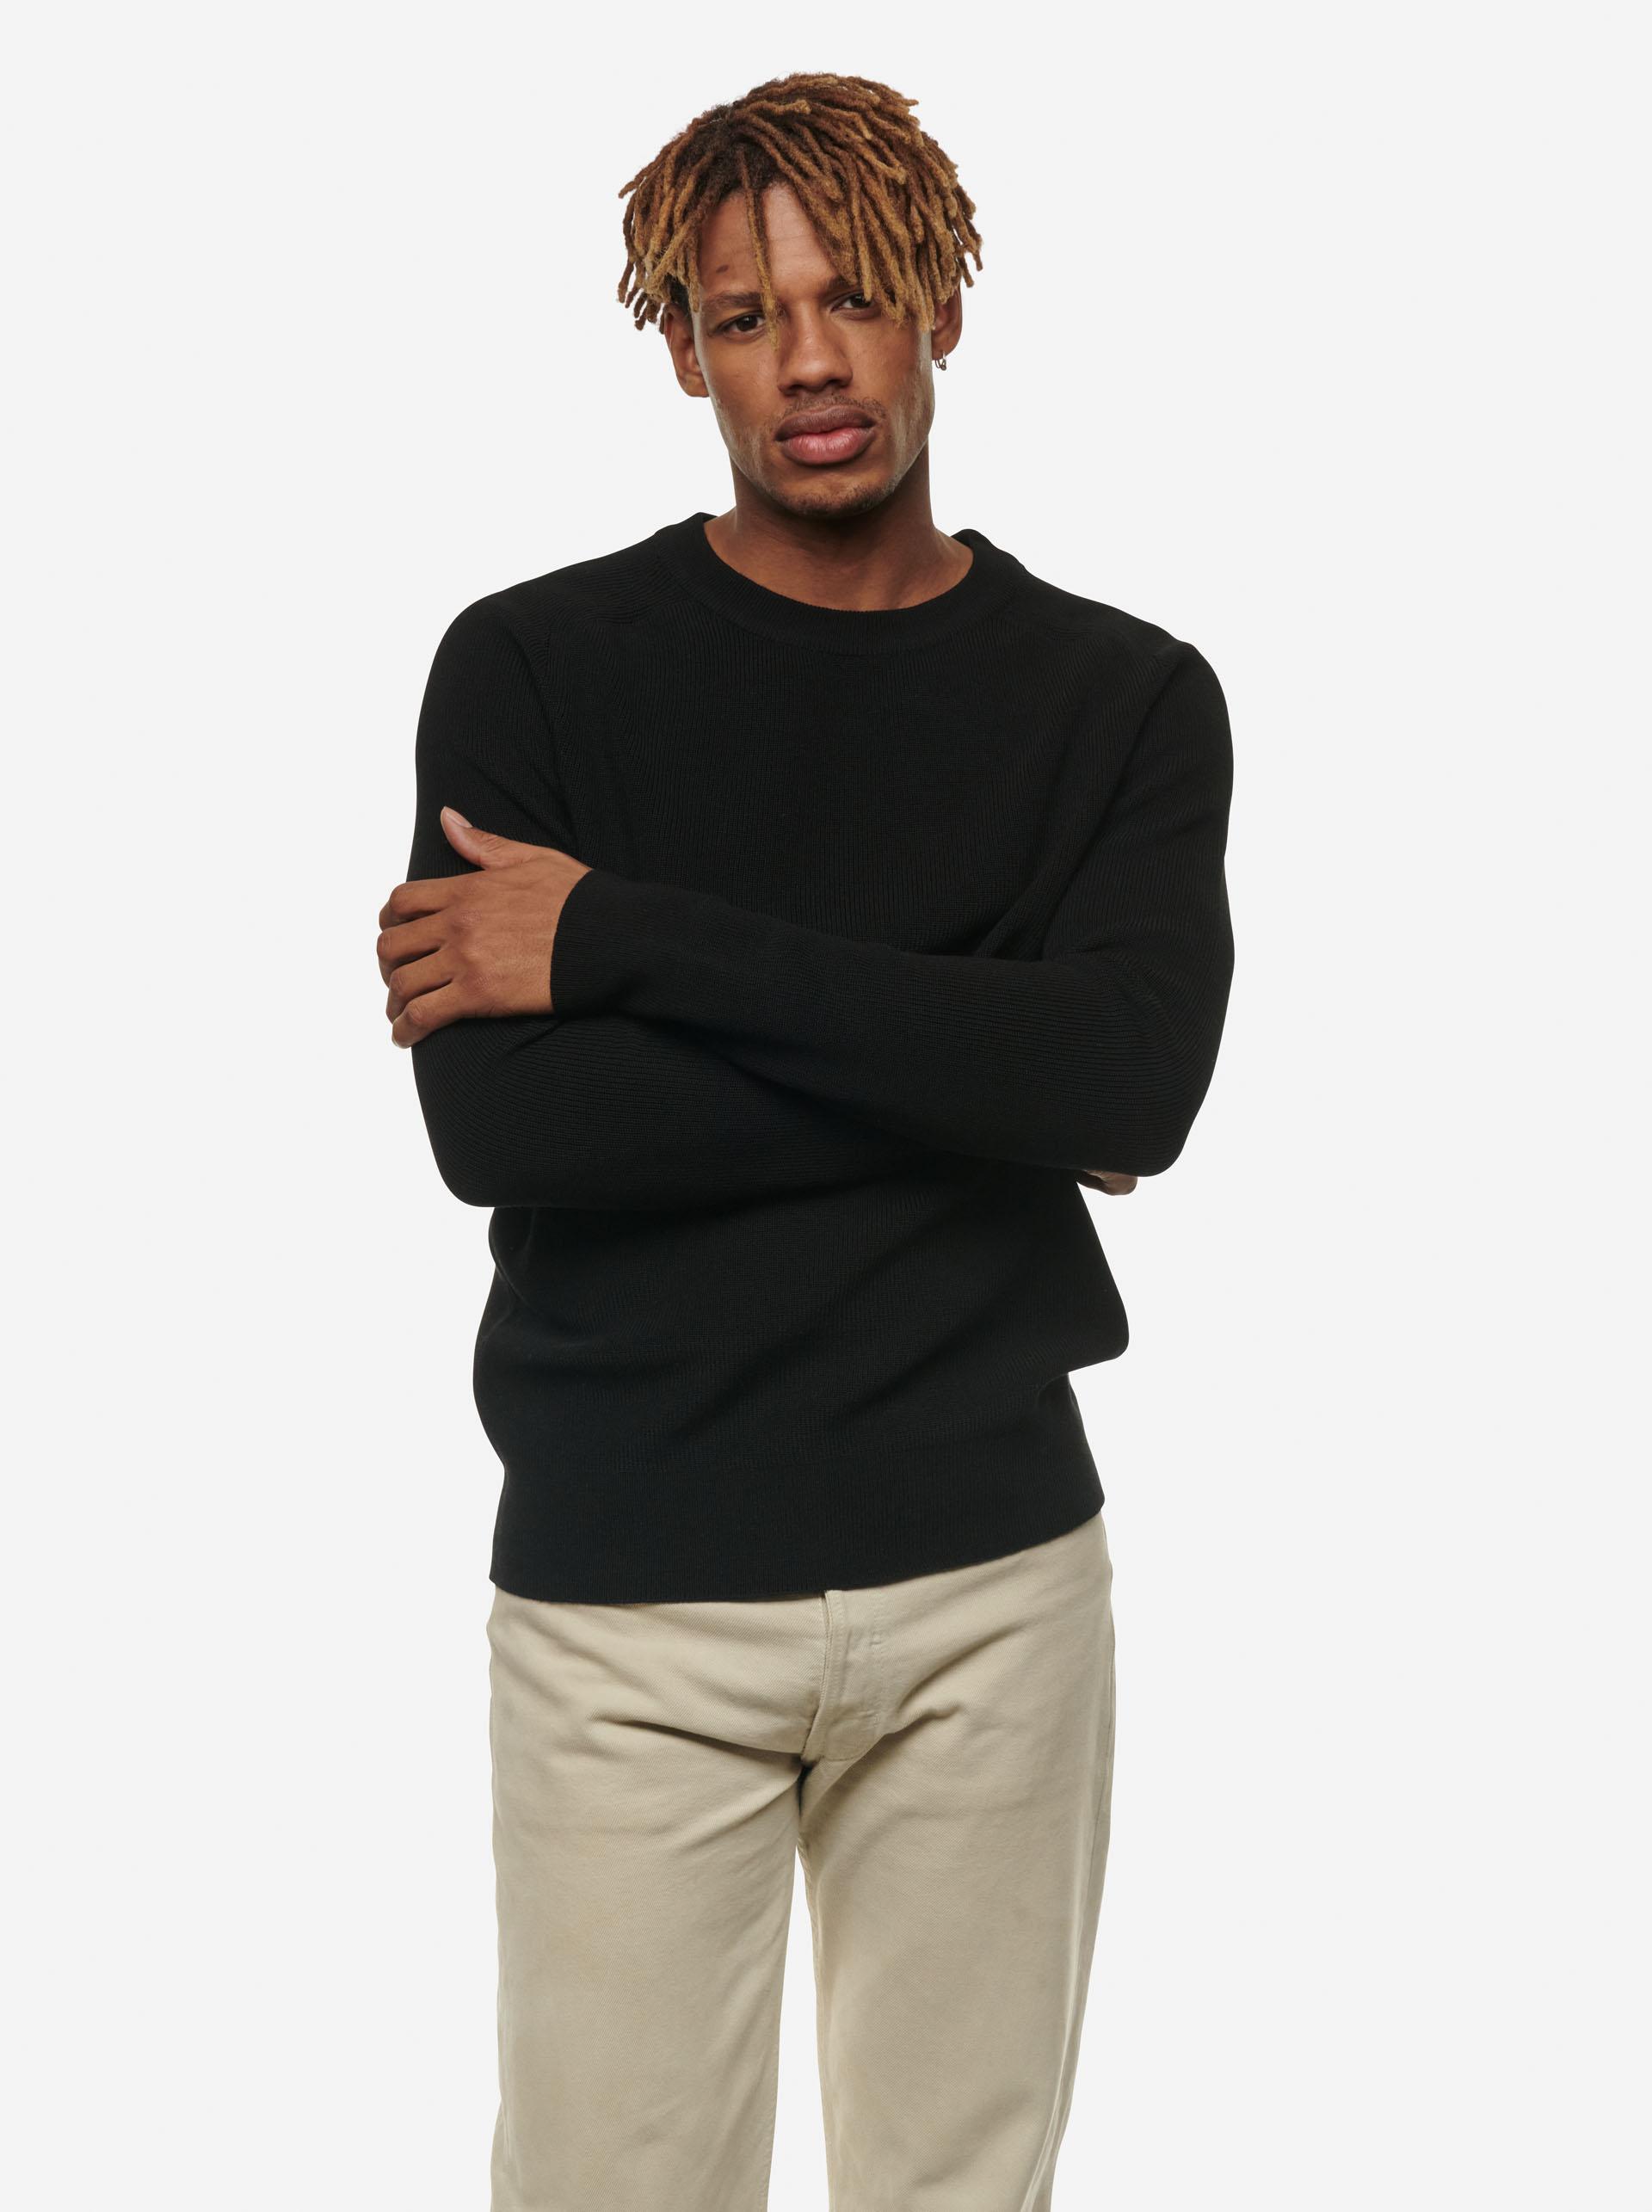 Teym - The Merino Sweater - Men - Black - 7